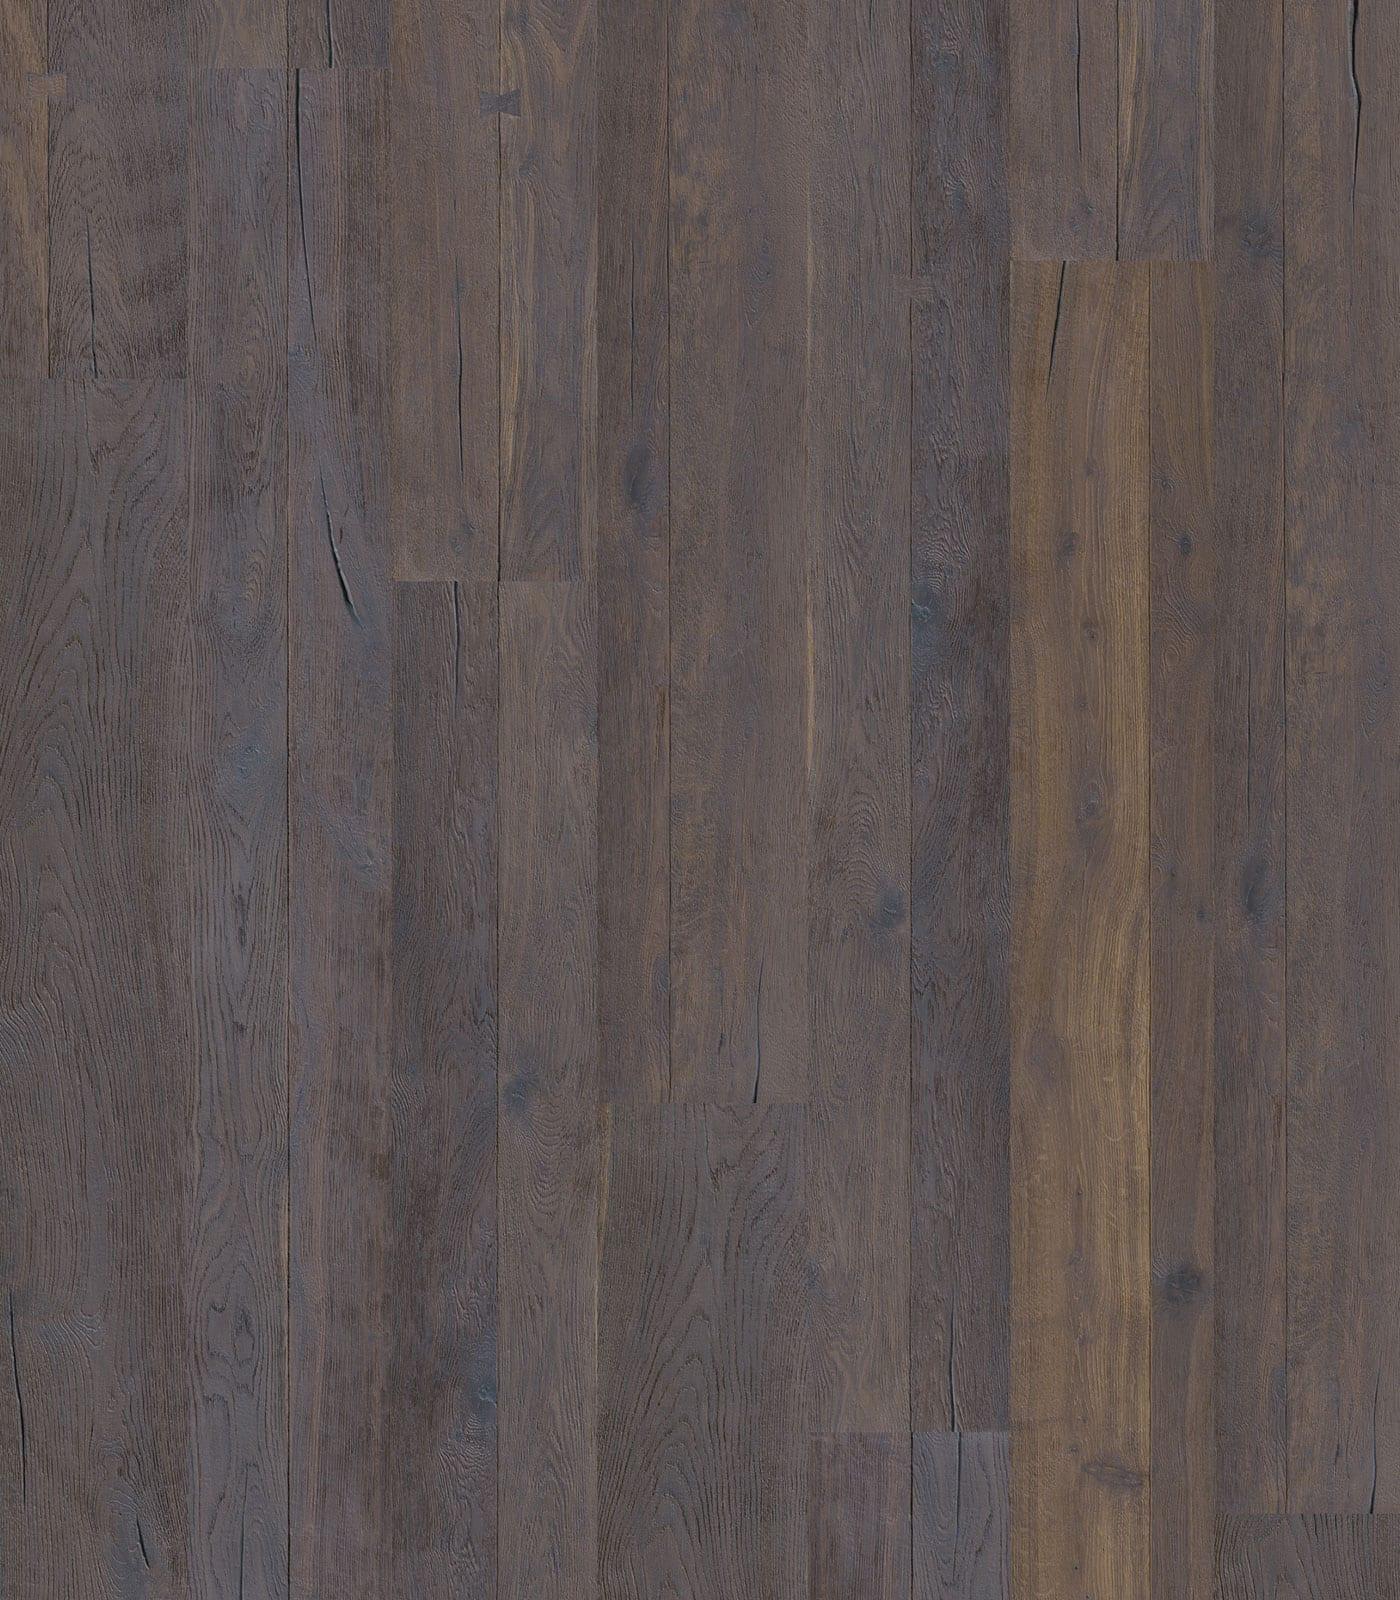 Alhambra-Heritage Collection-European Oak Floors-flat